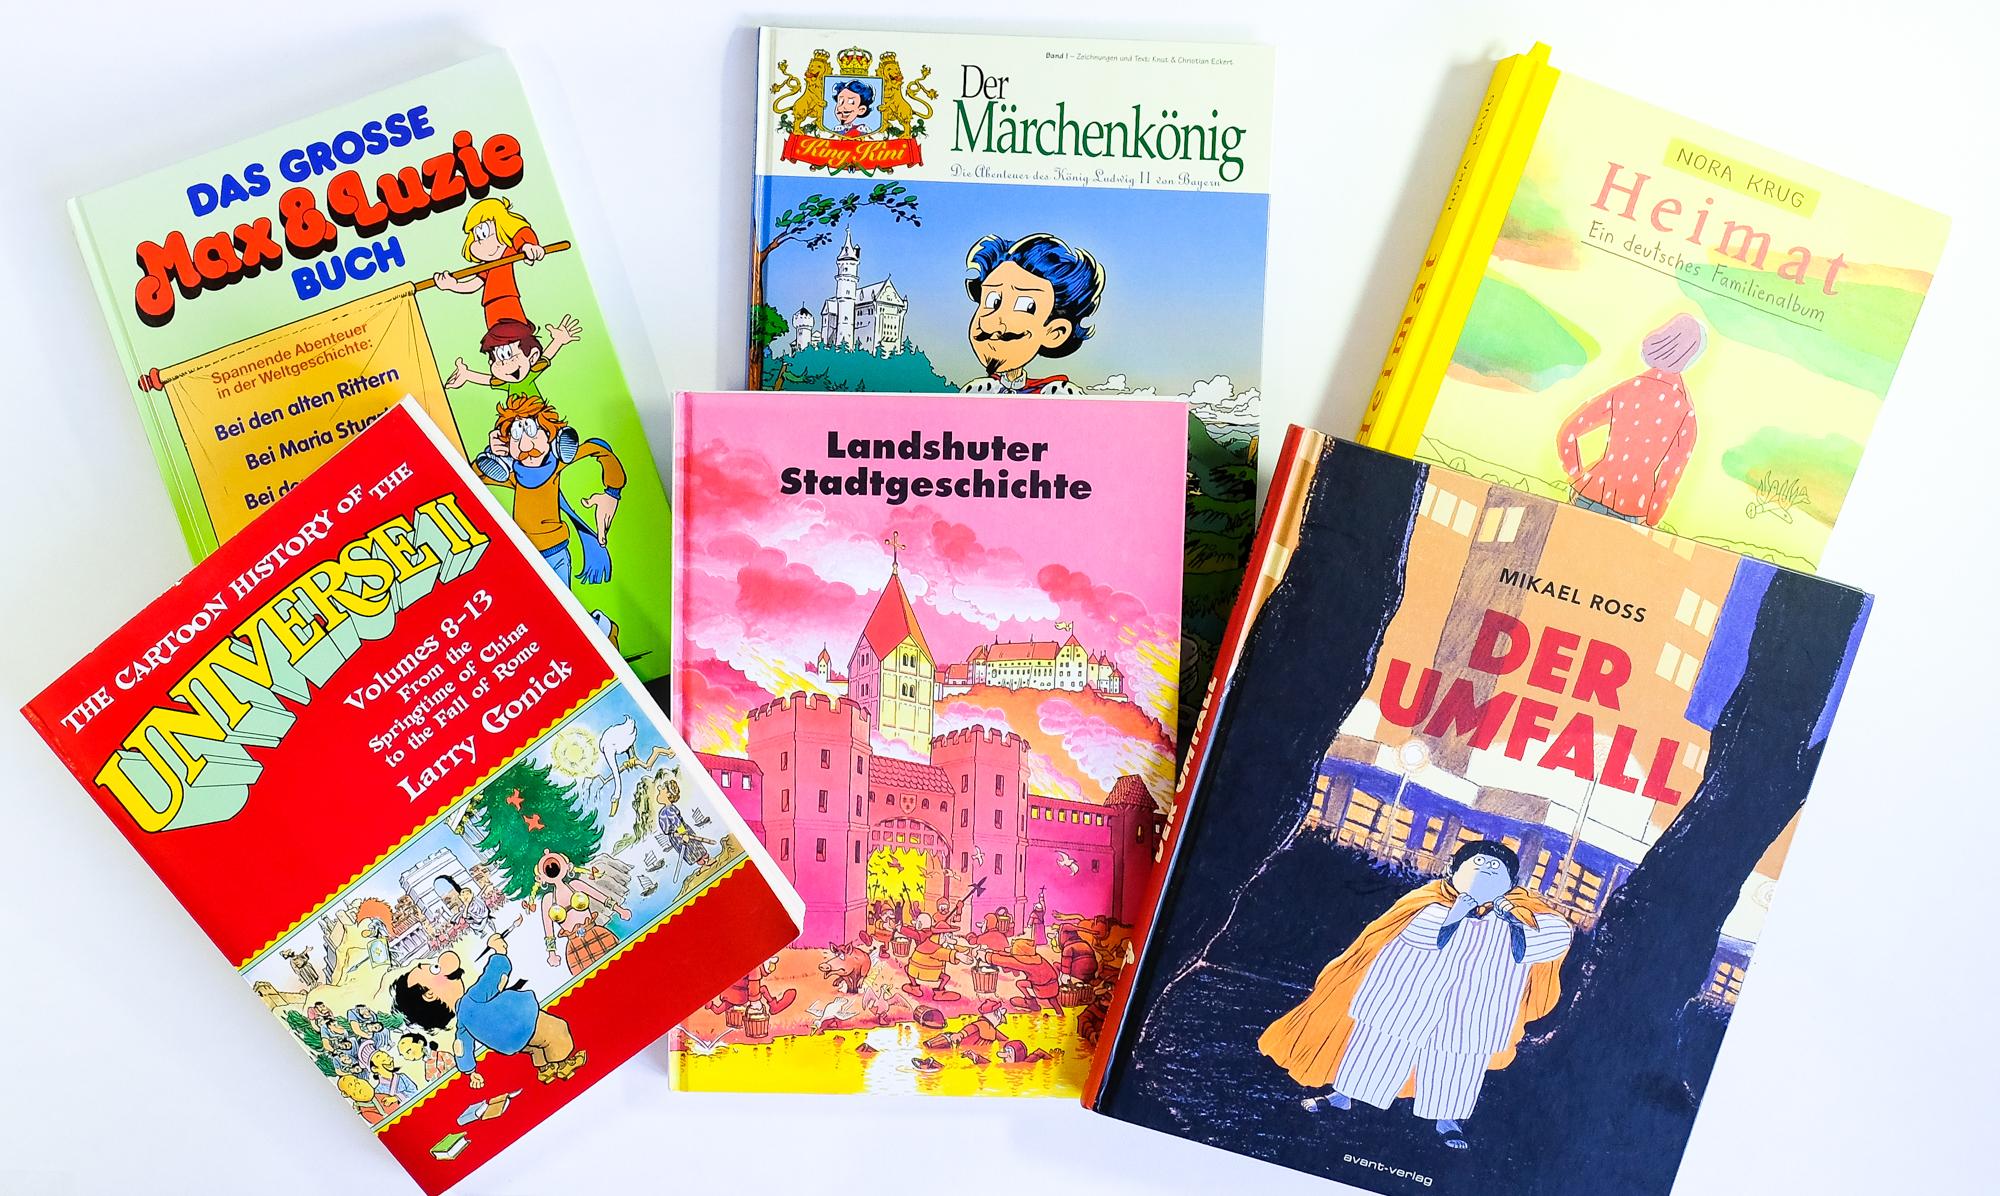 Geschichte im Comic: kleine Auswahl an Comics mit Geschichtsbezug.